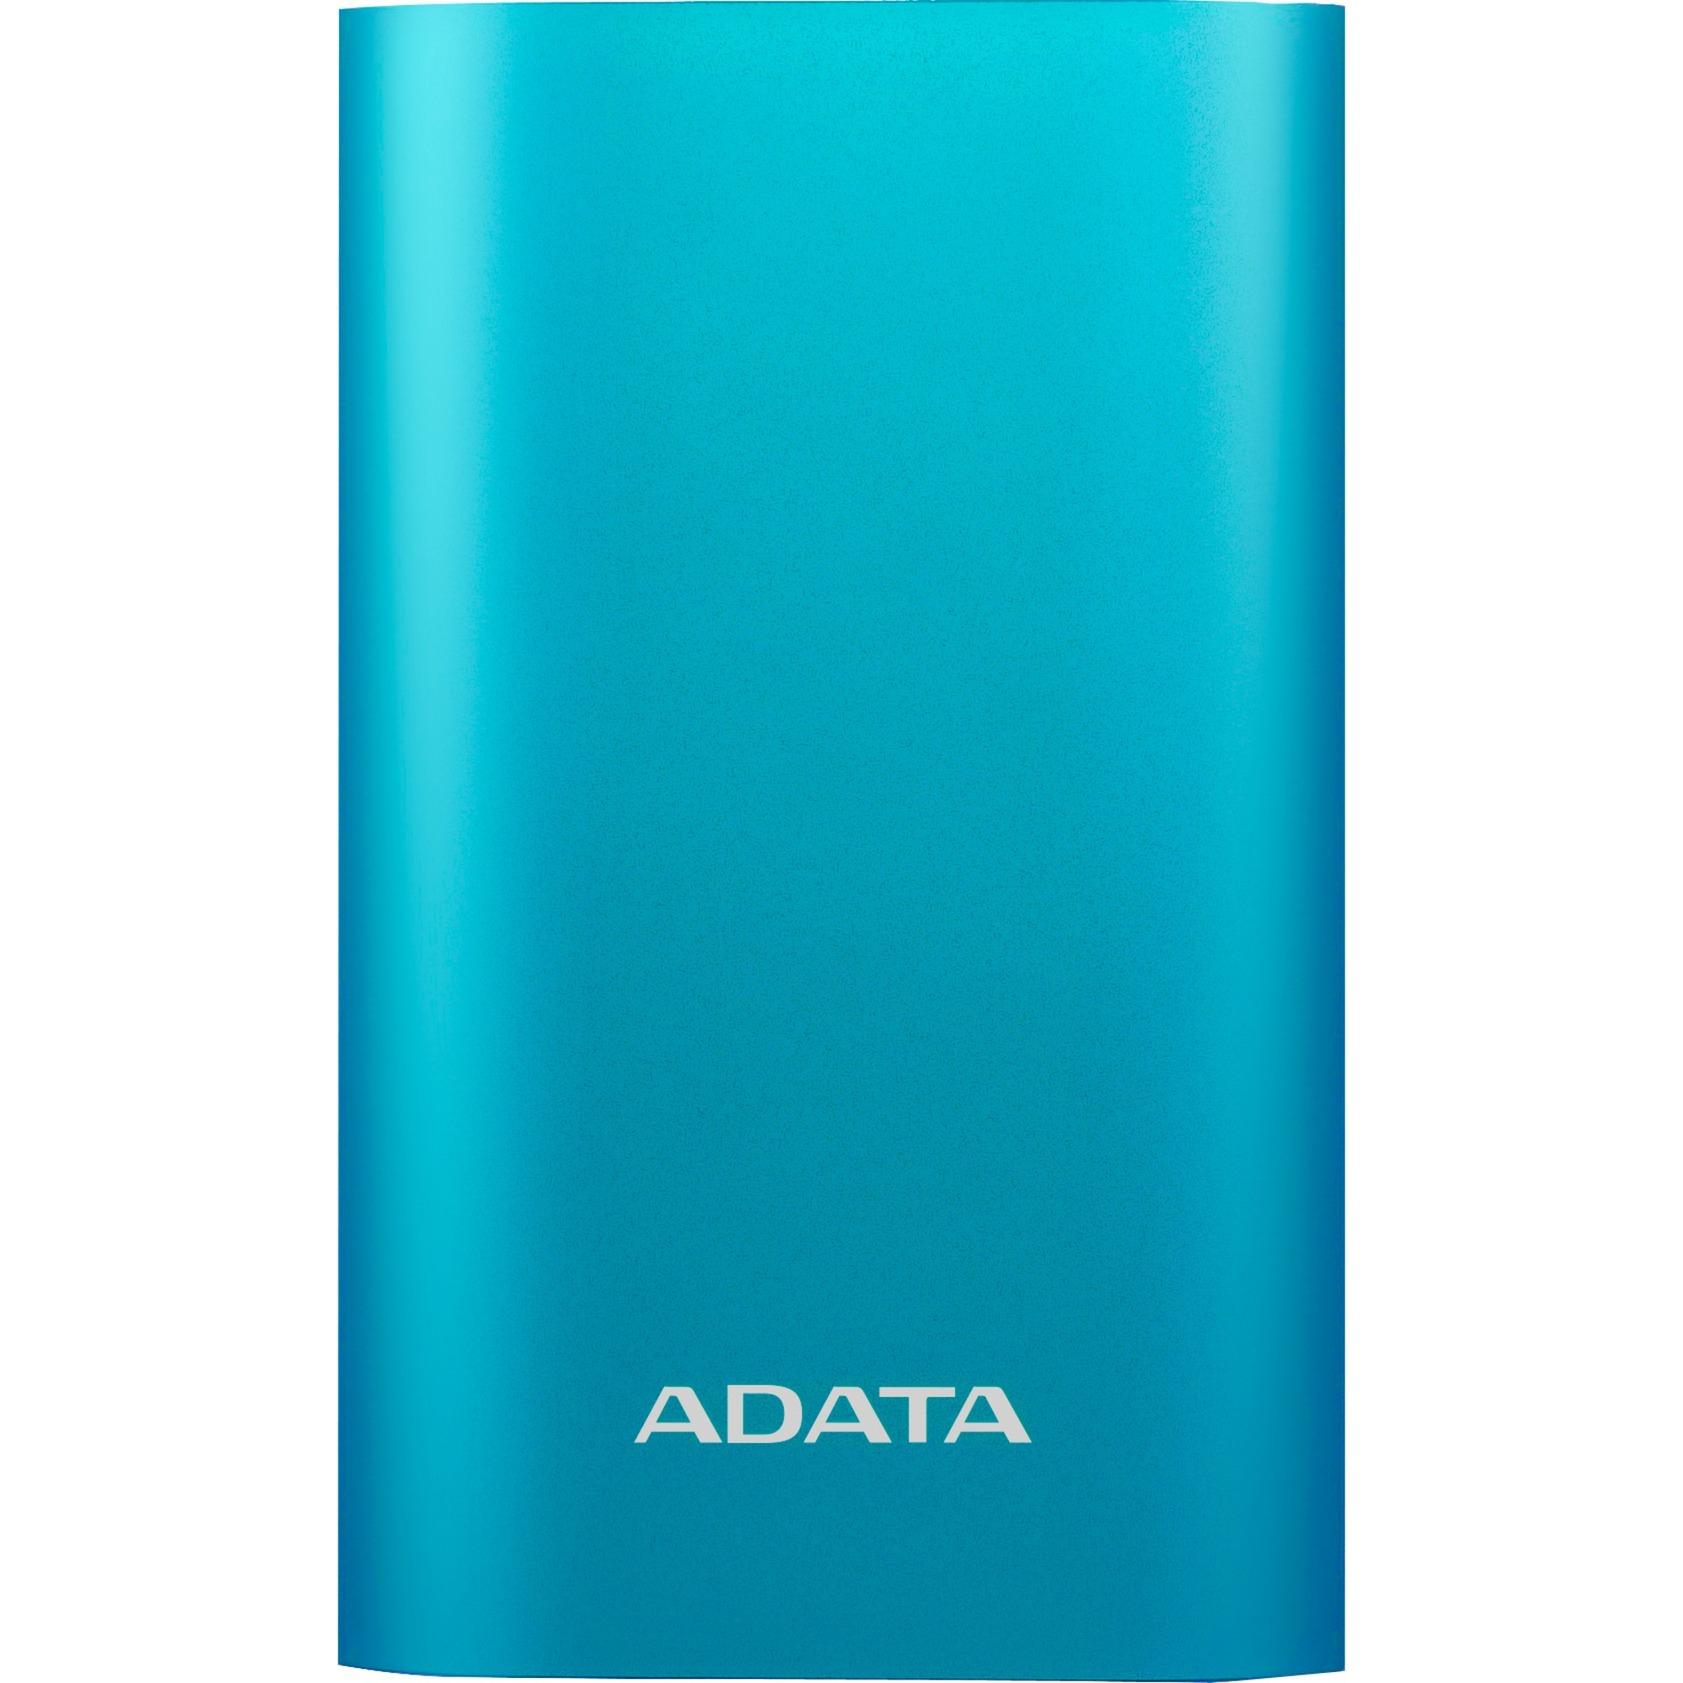 a10050qc-lithium-ion-li-ion-10050mah-blaa-oplader-til-genopladelig-batteri-power-bank